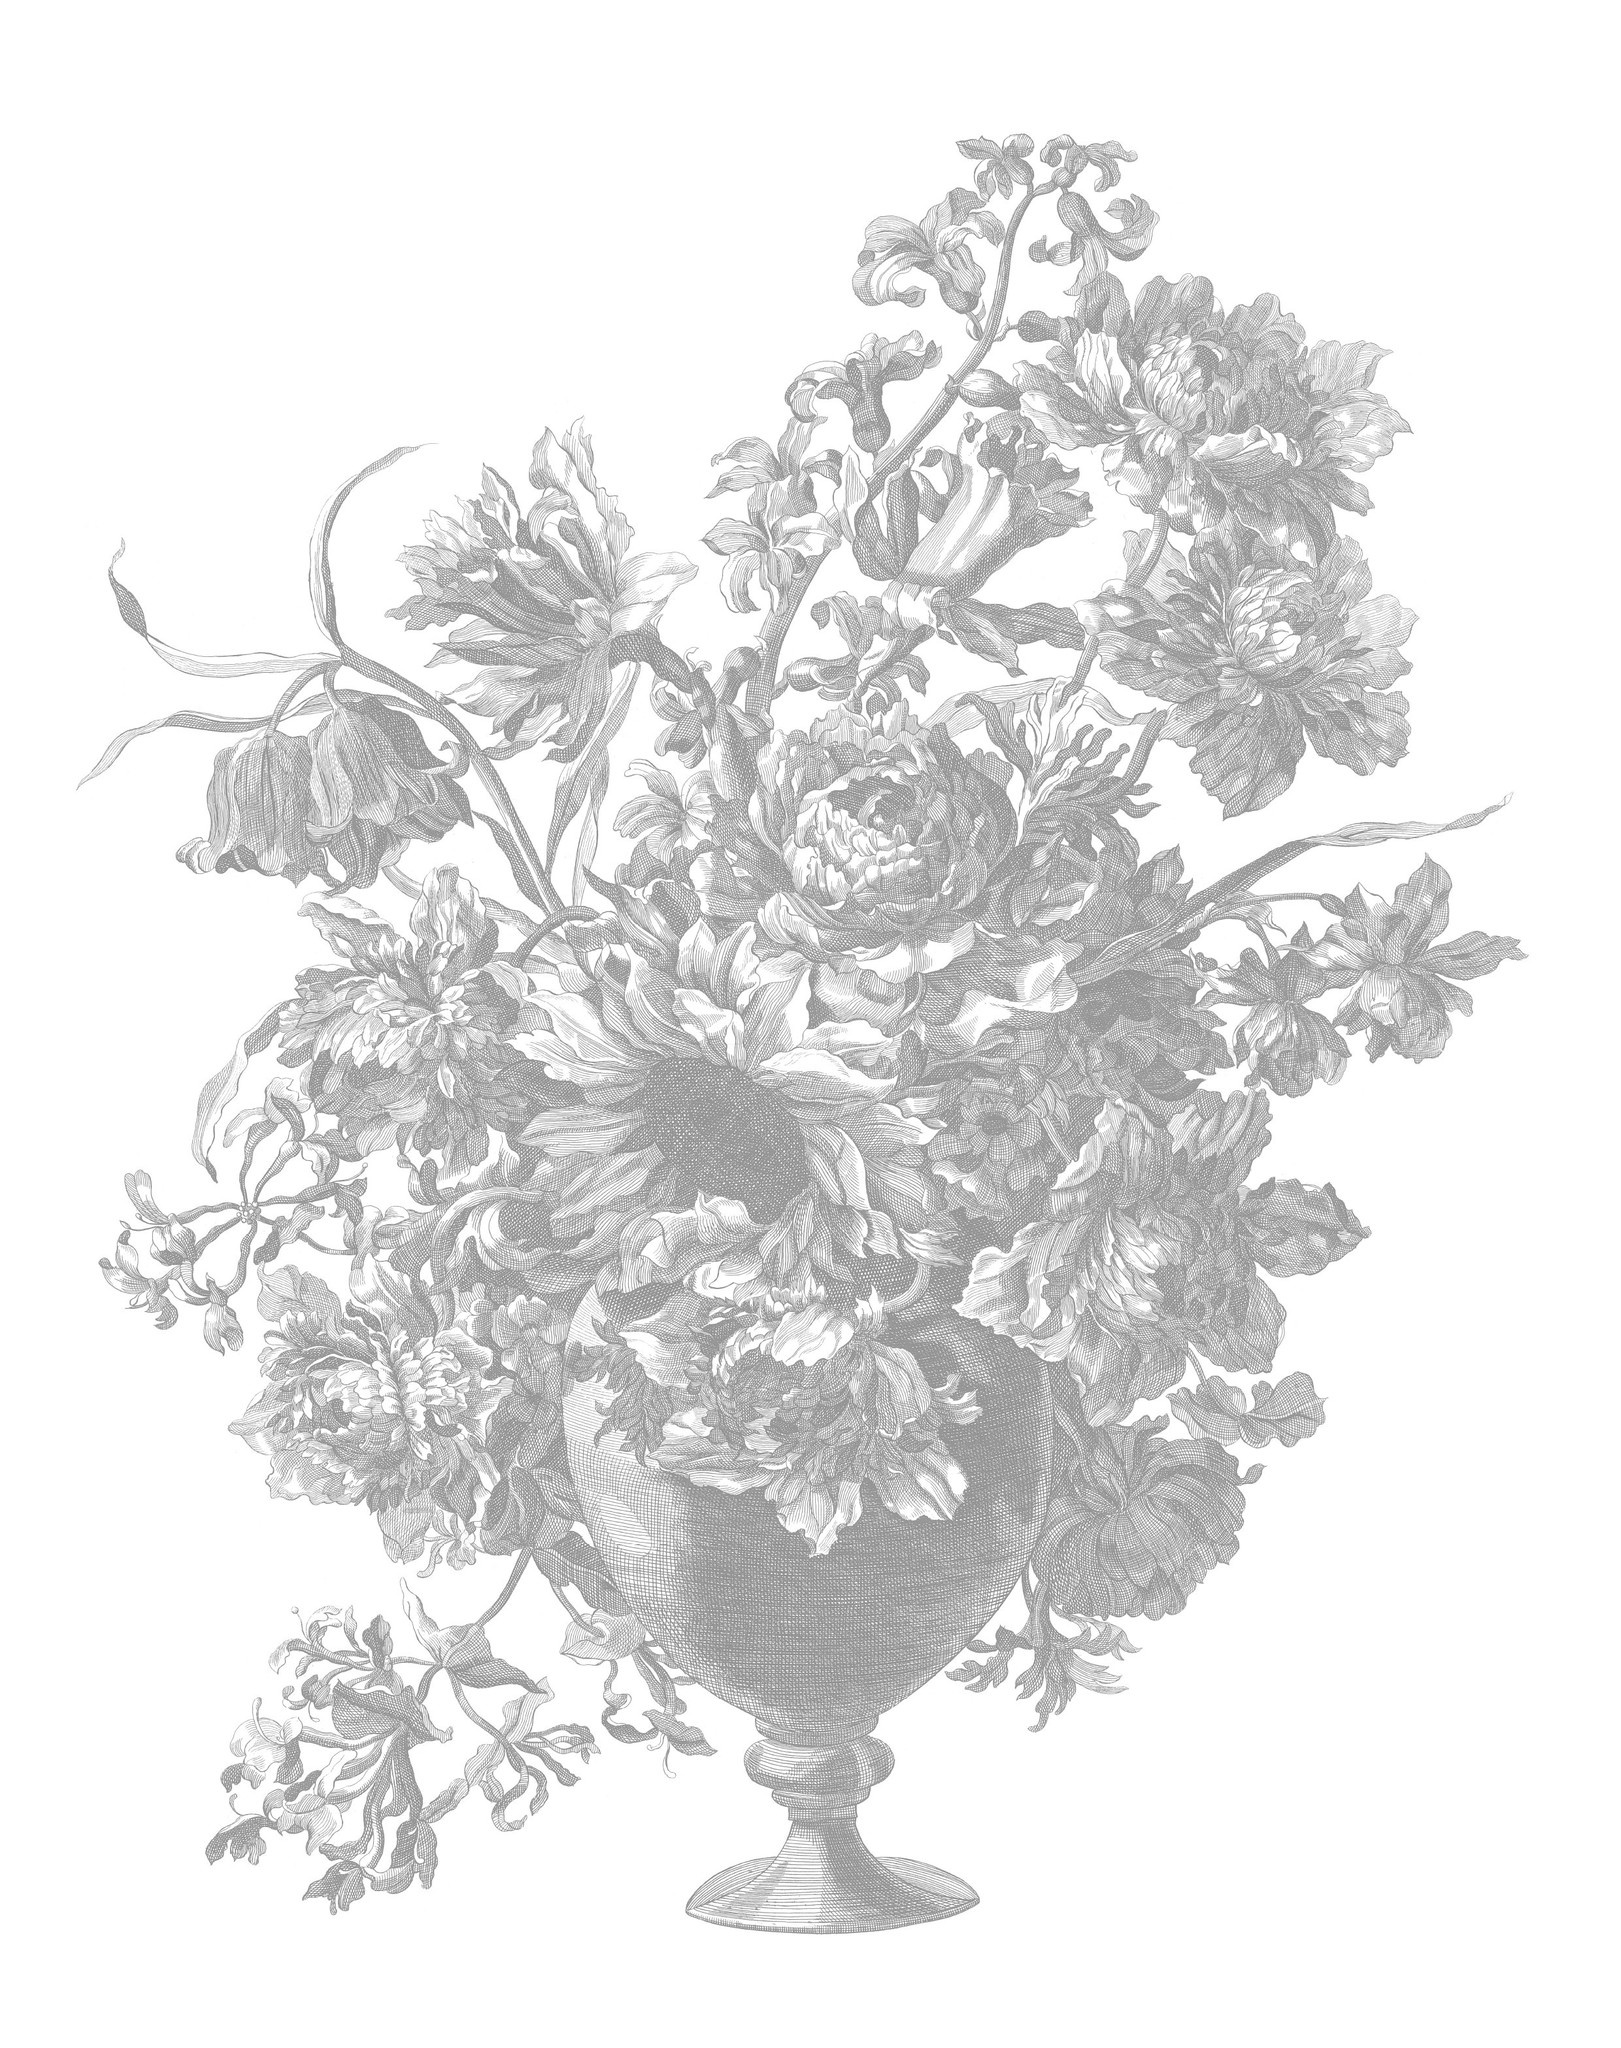 Behang Engraved Flowers 142.5x180cm-1